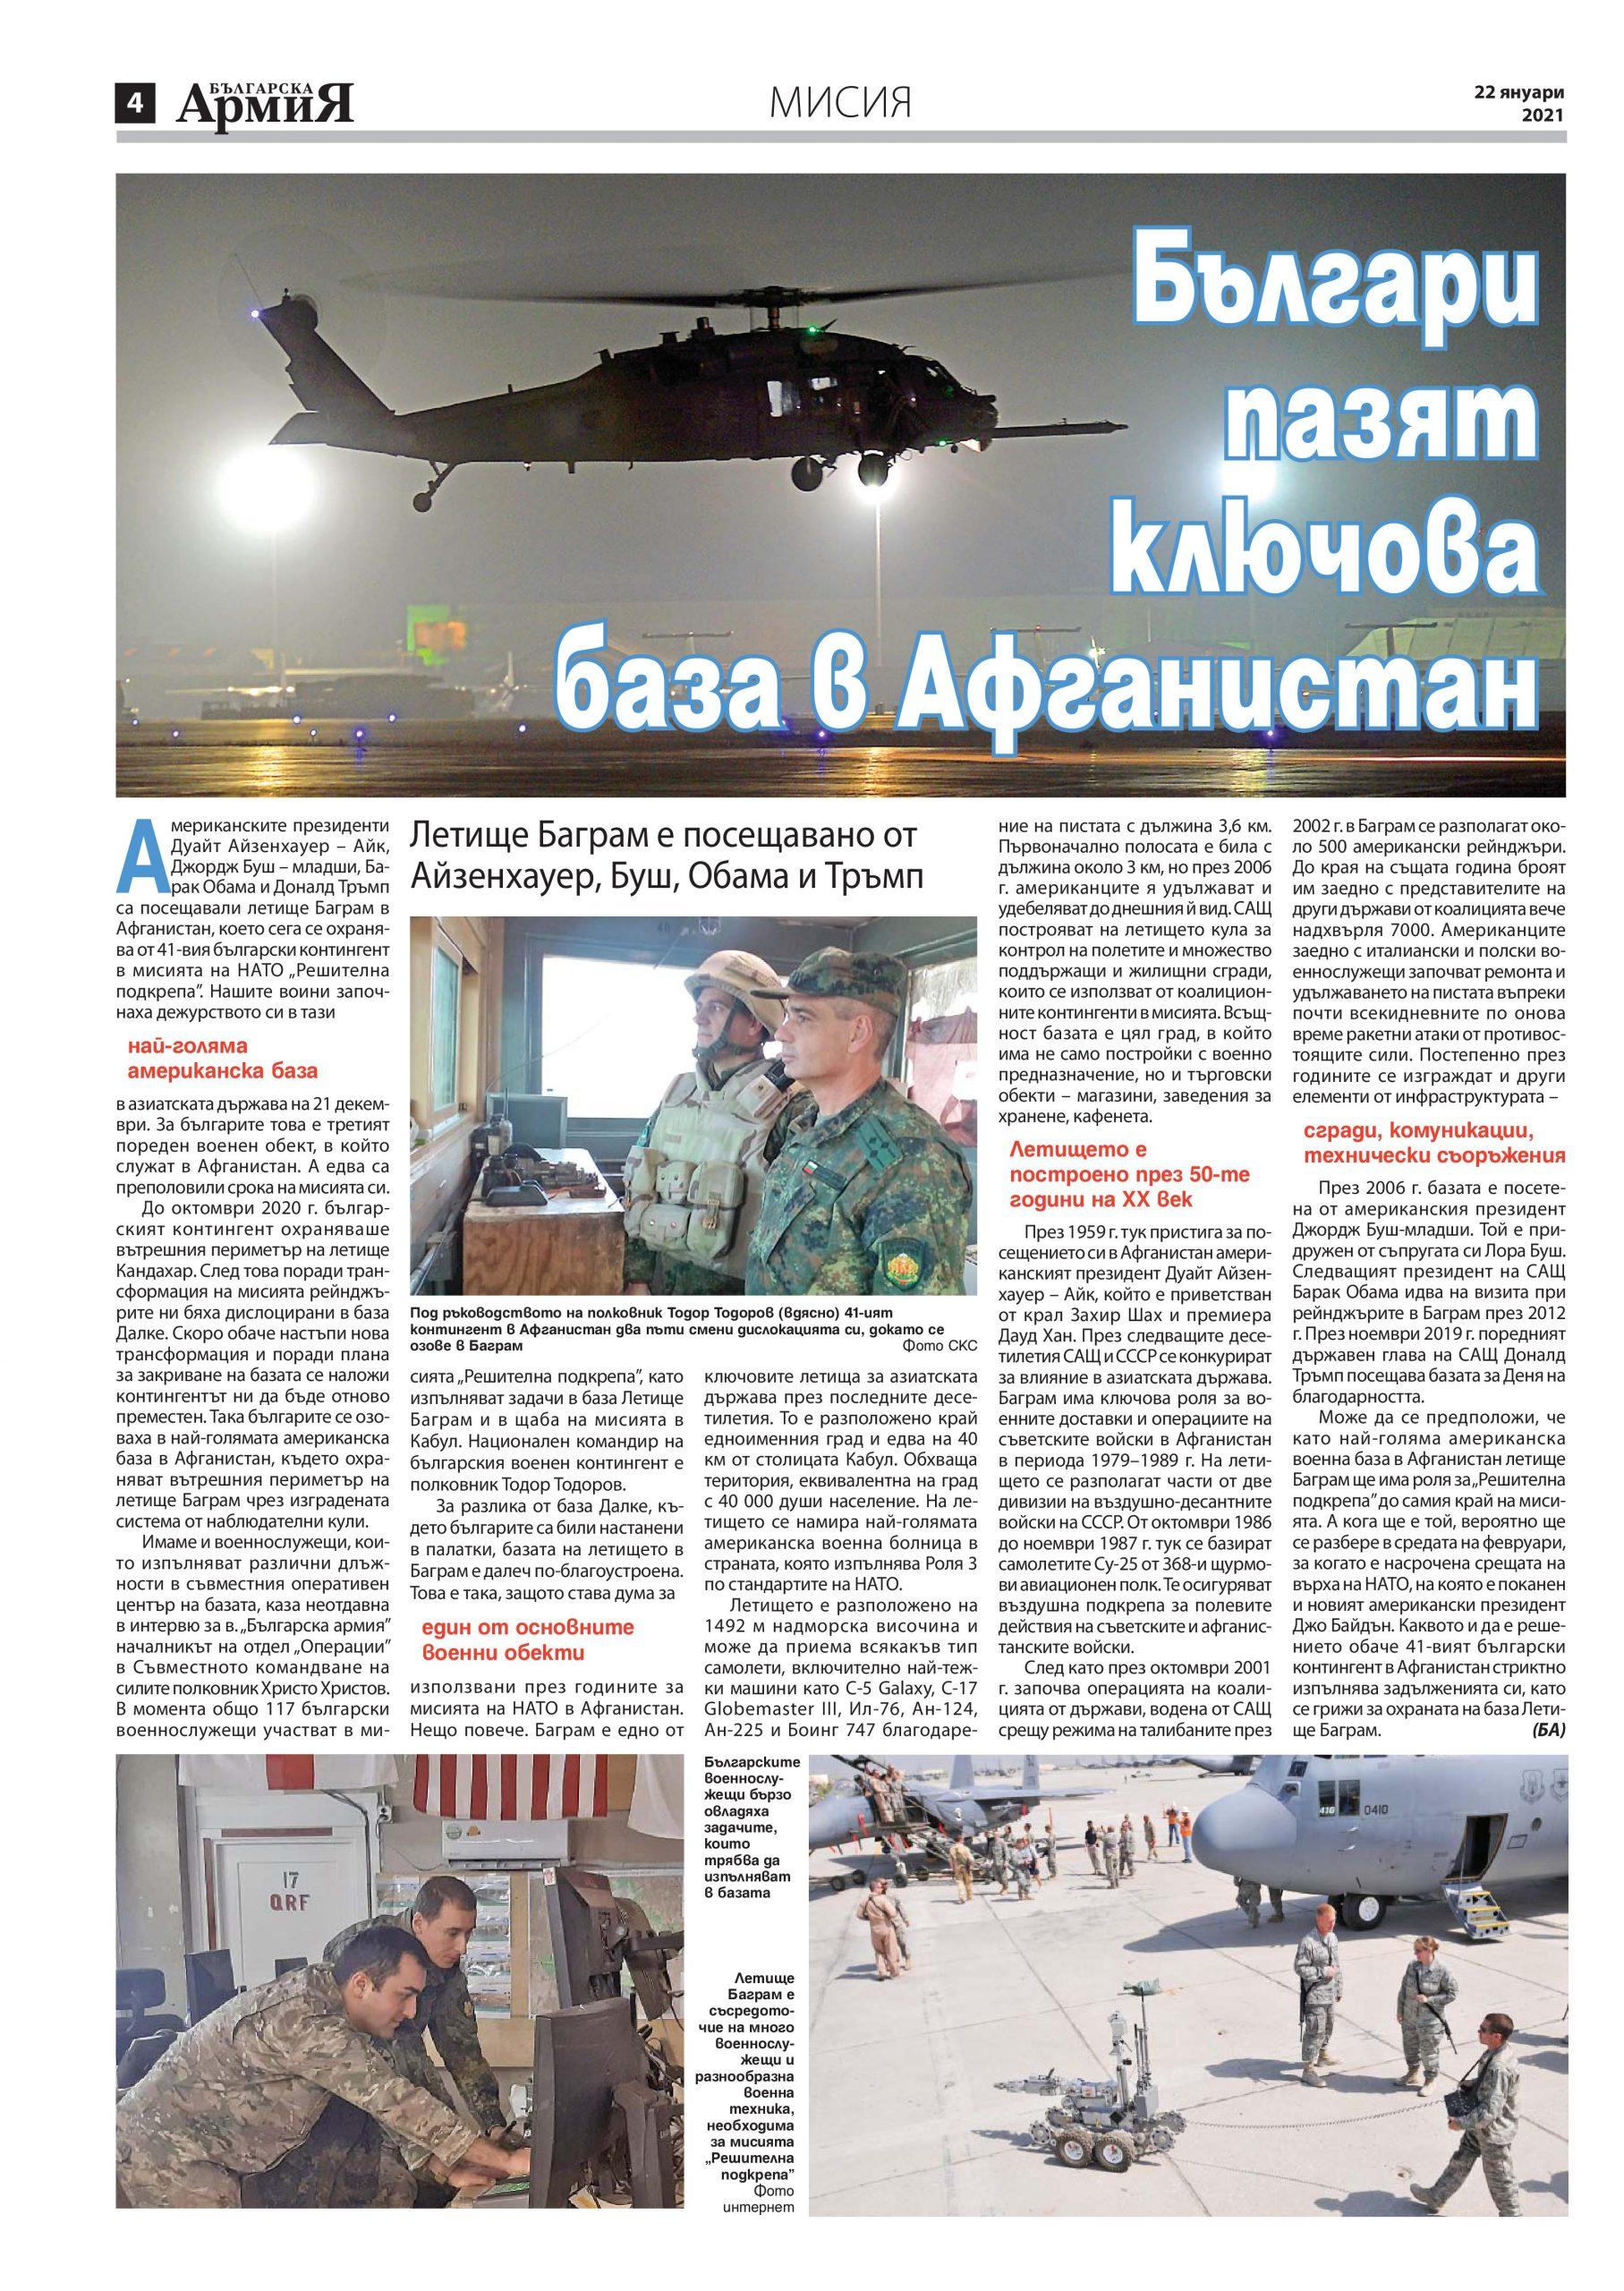 https://armymedia.bg/wp-content/uploads/2015/06/04-56-scaled.jpg